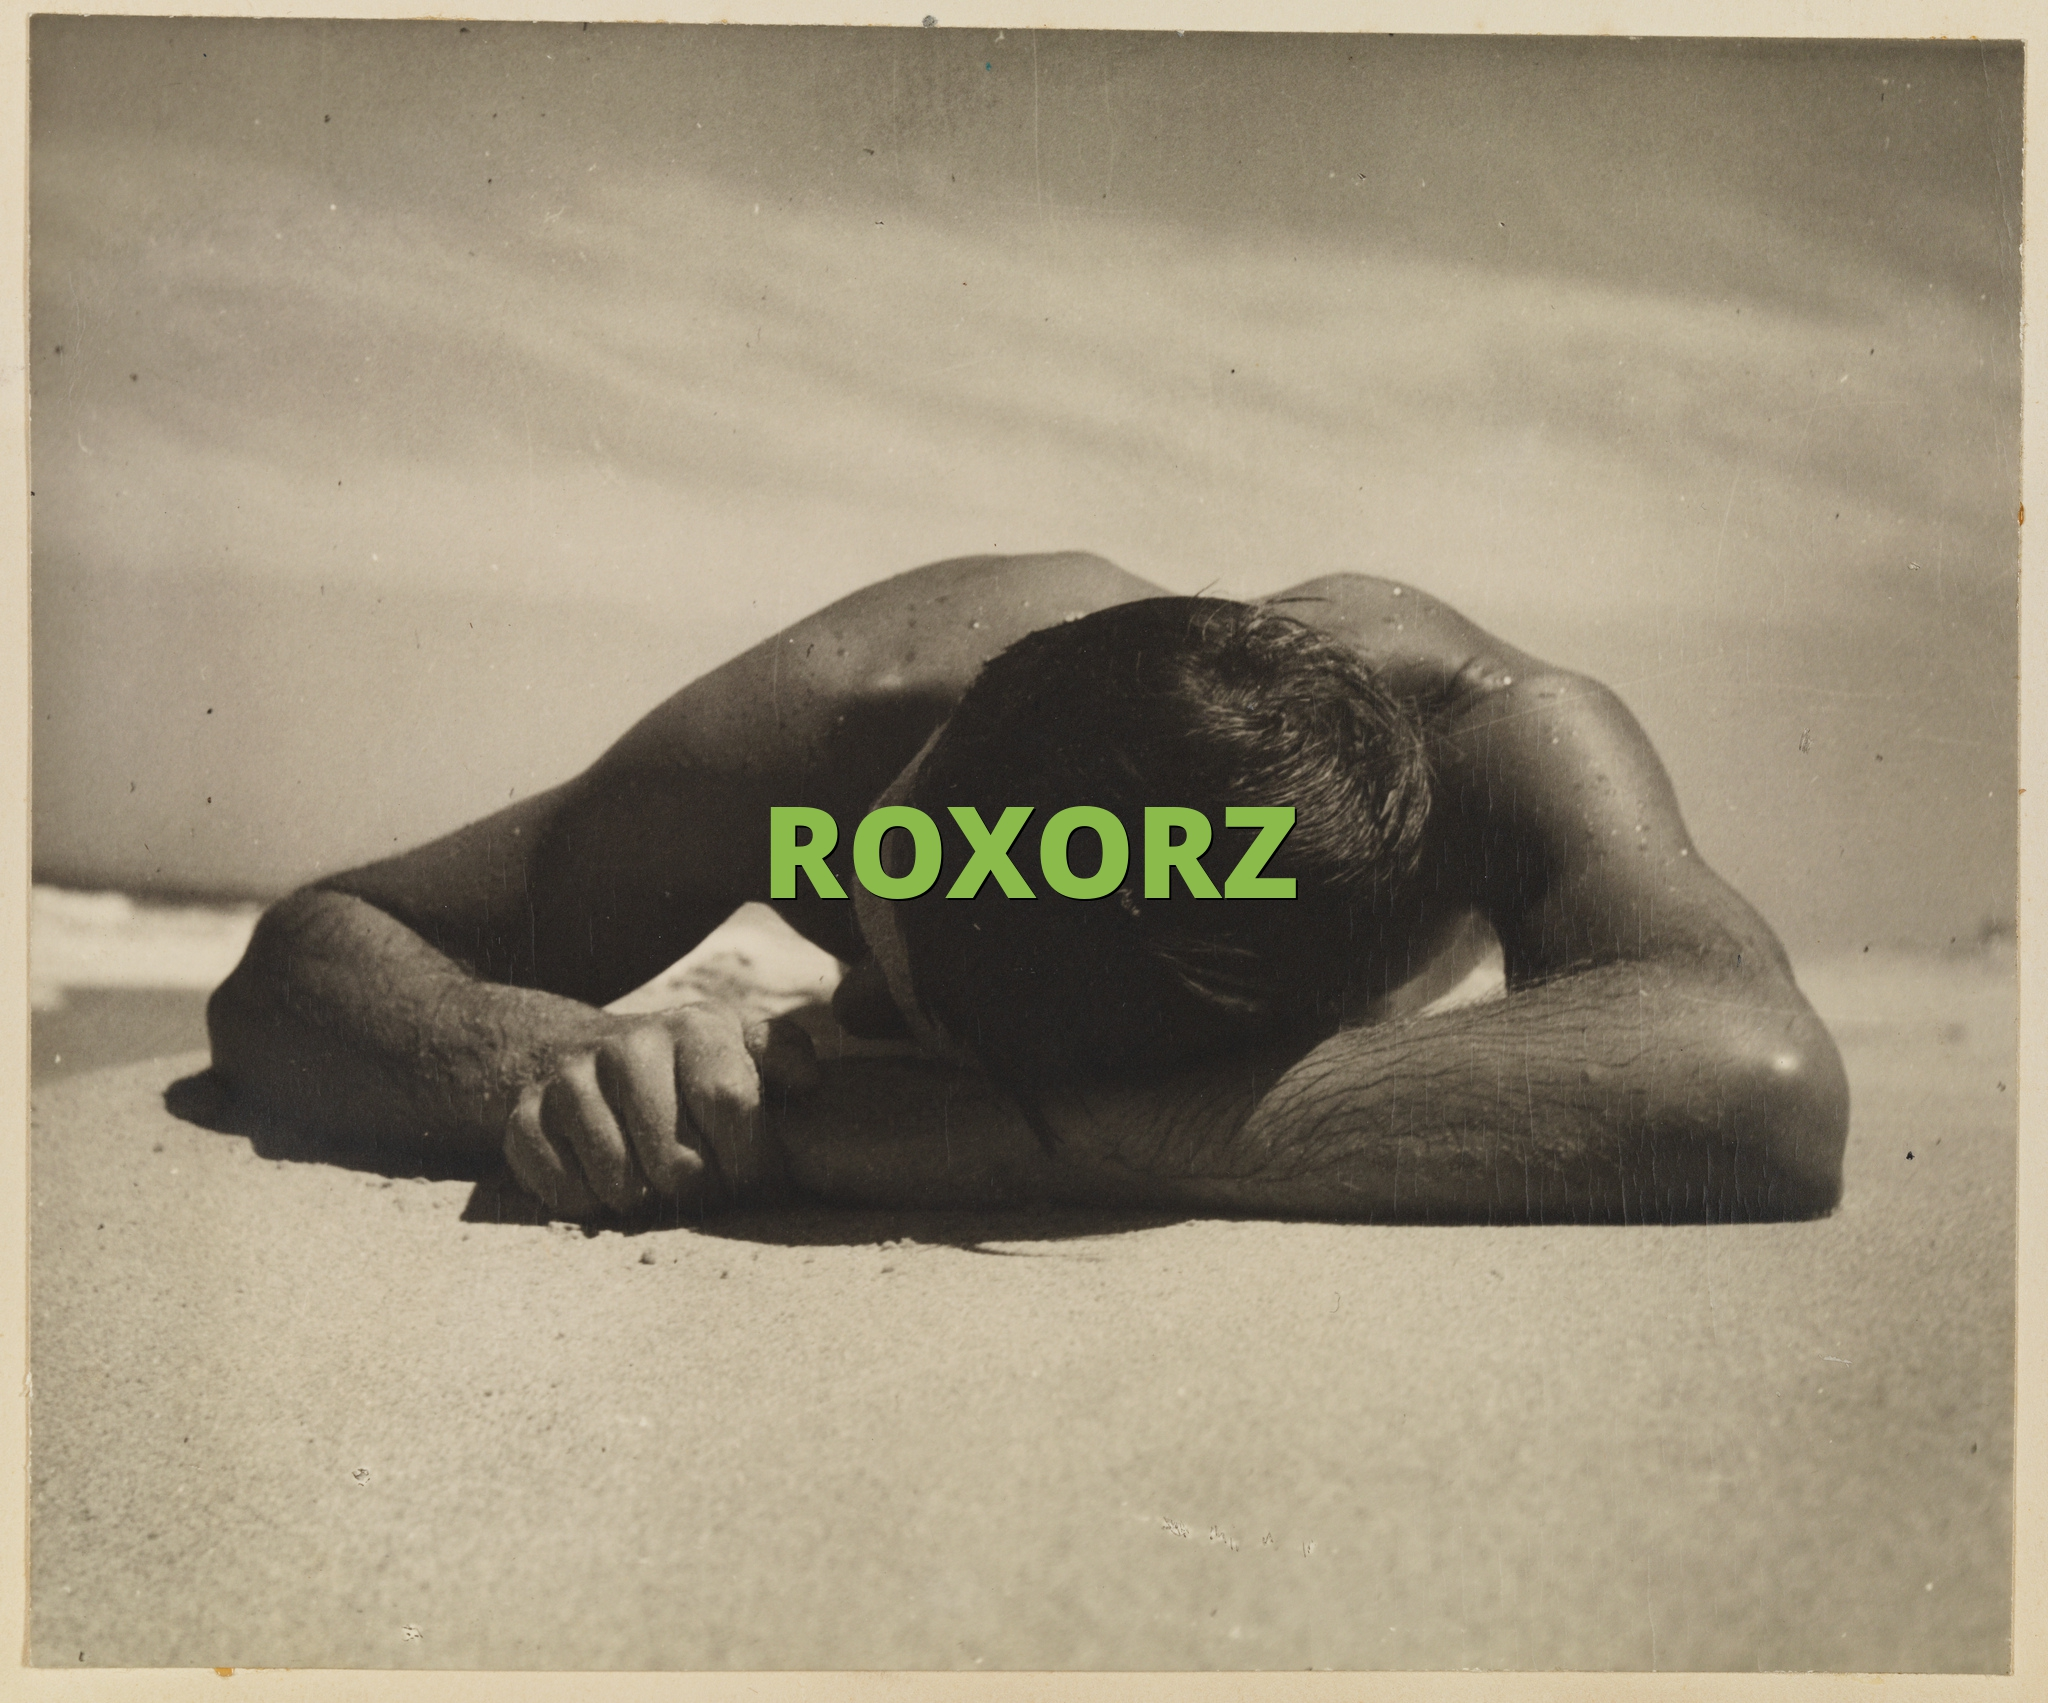 ROXORZ